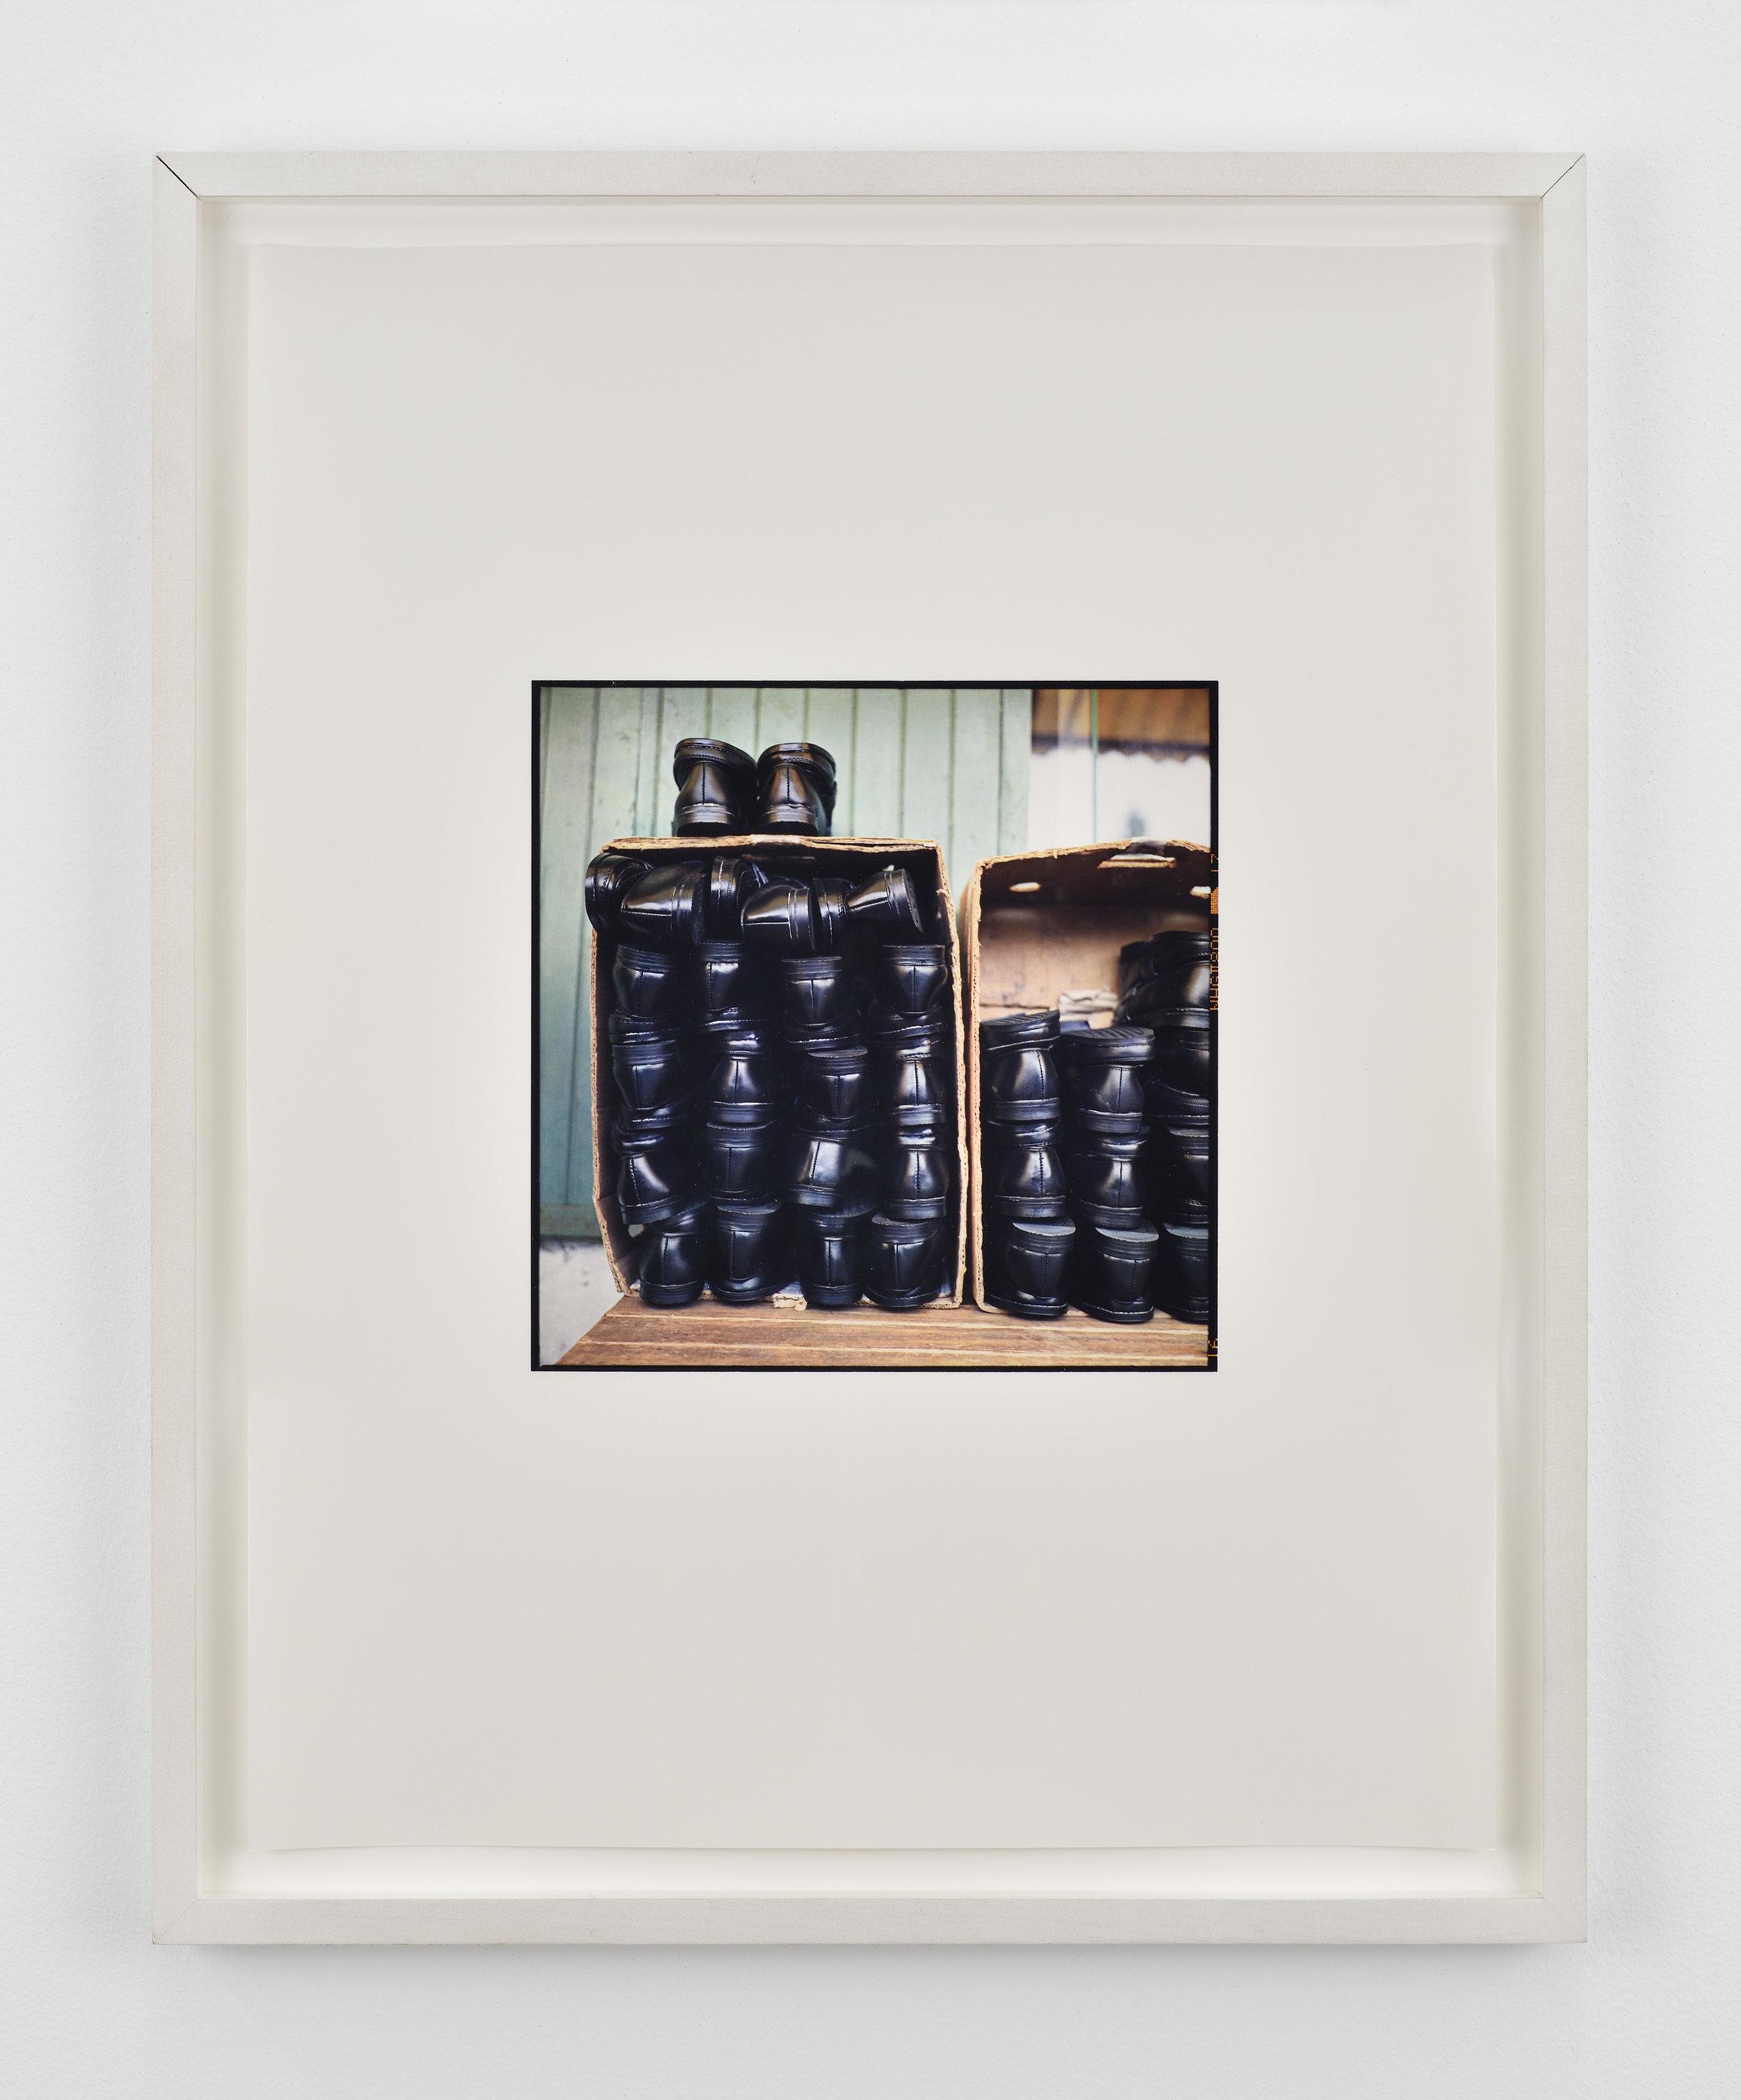 Zoe Leonard Shoes, 2000/2001 dye transfer print 22 x 18 in (55,9 x 45,7 cm) Edition of 6